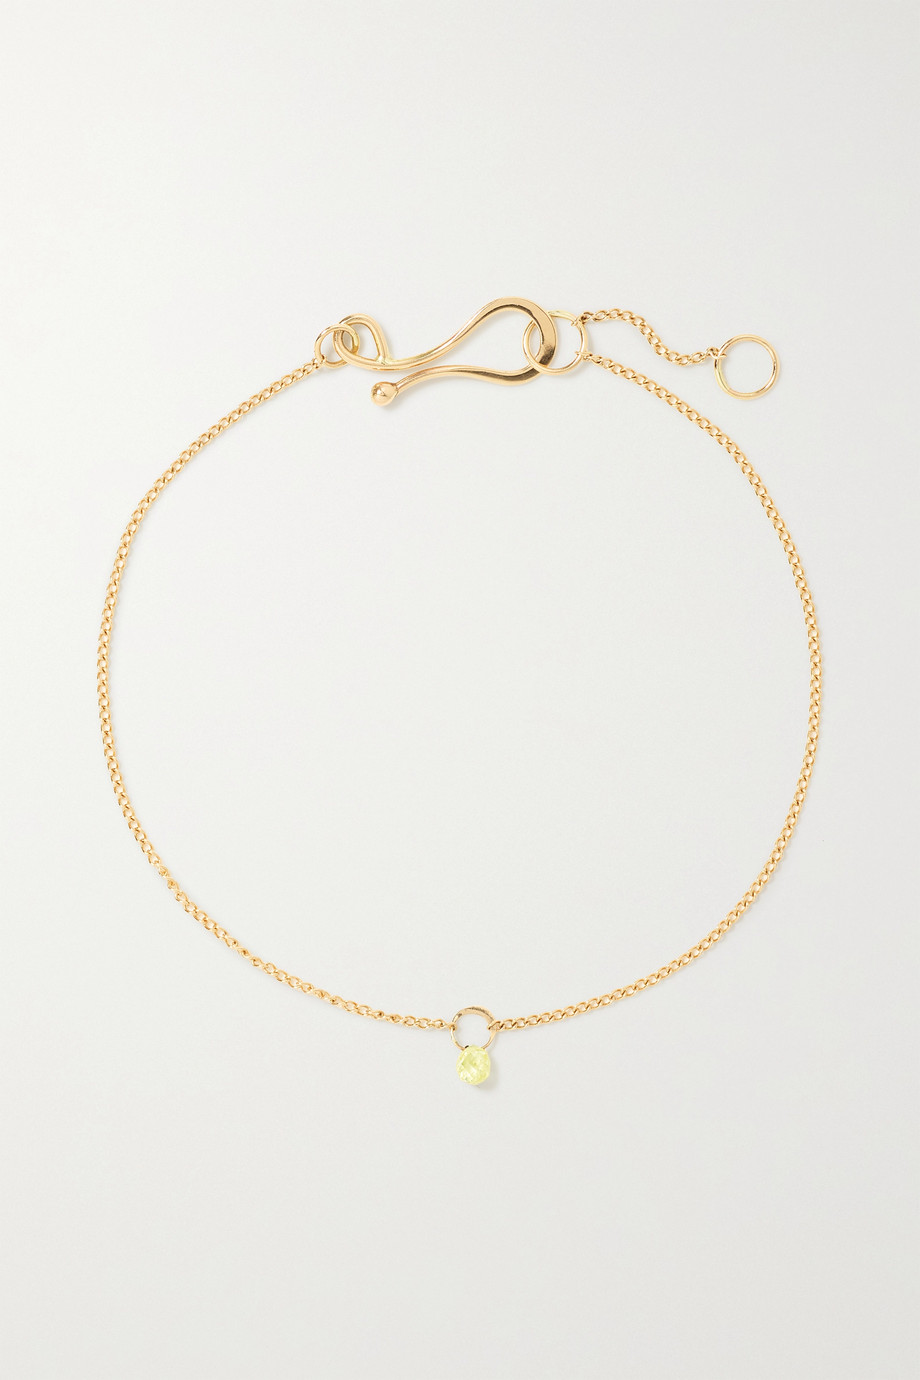 Melissa Joy Manning 14-karat recycled gold labradorite bracelet